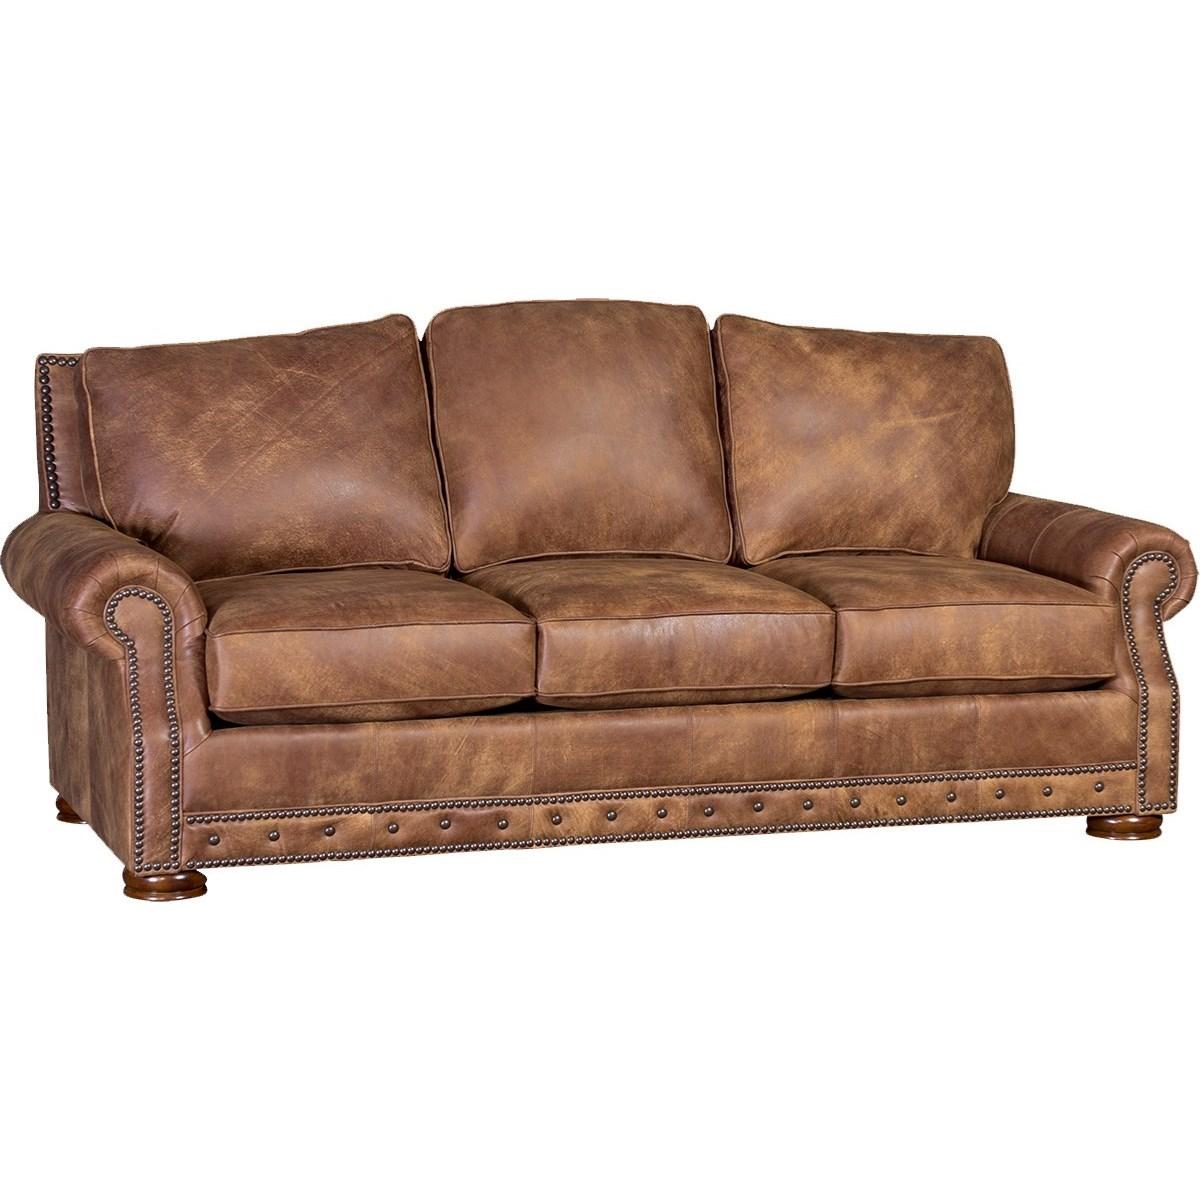 2900 Sofa by Mayo at Story & Lee Furniture